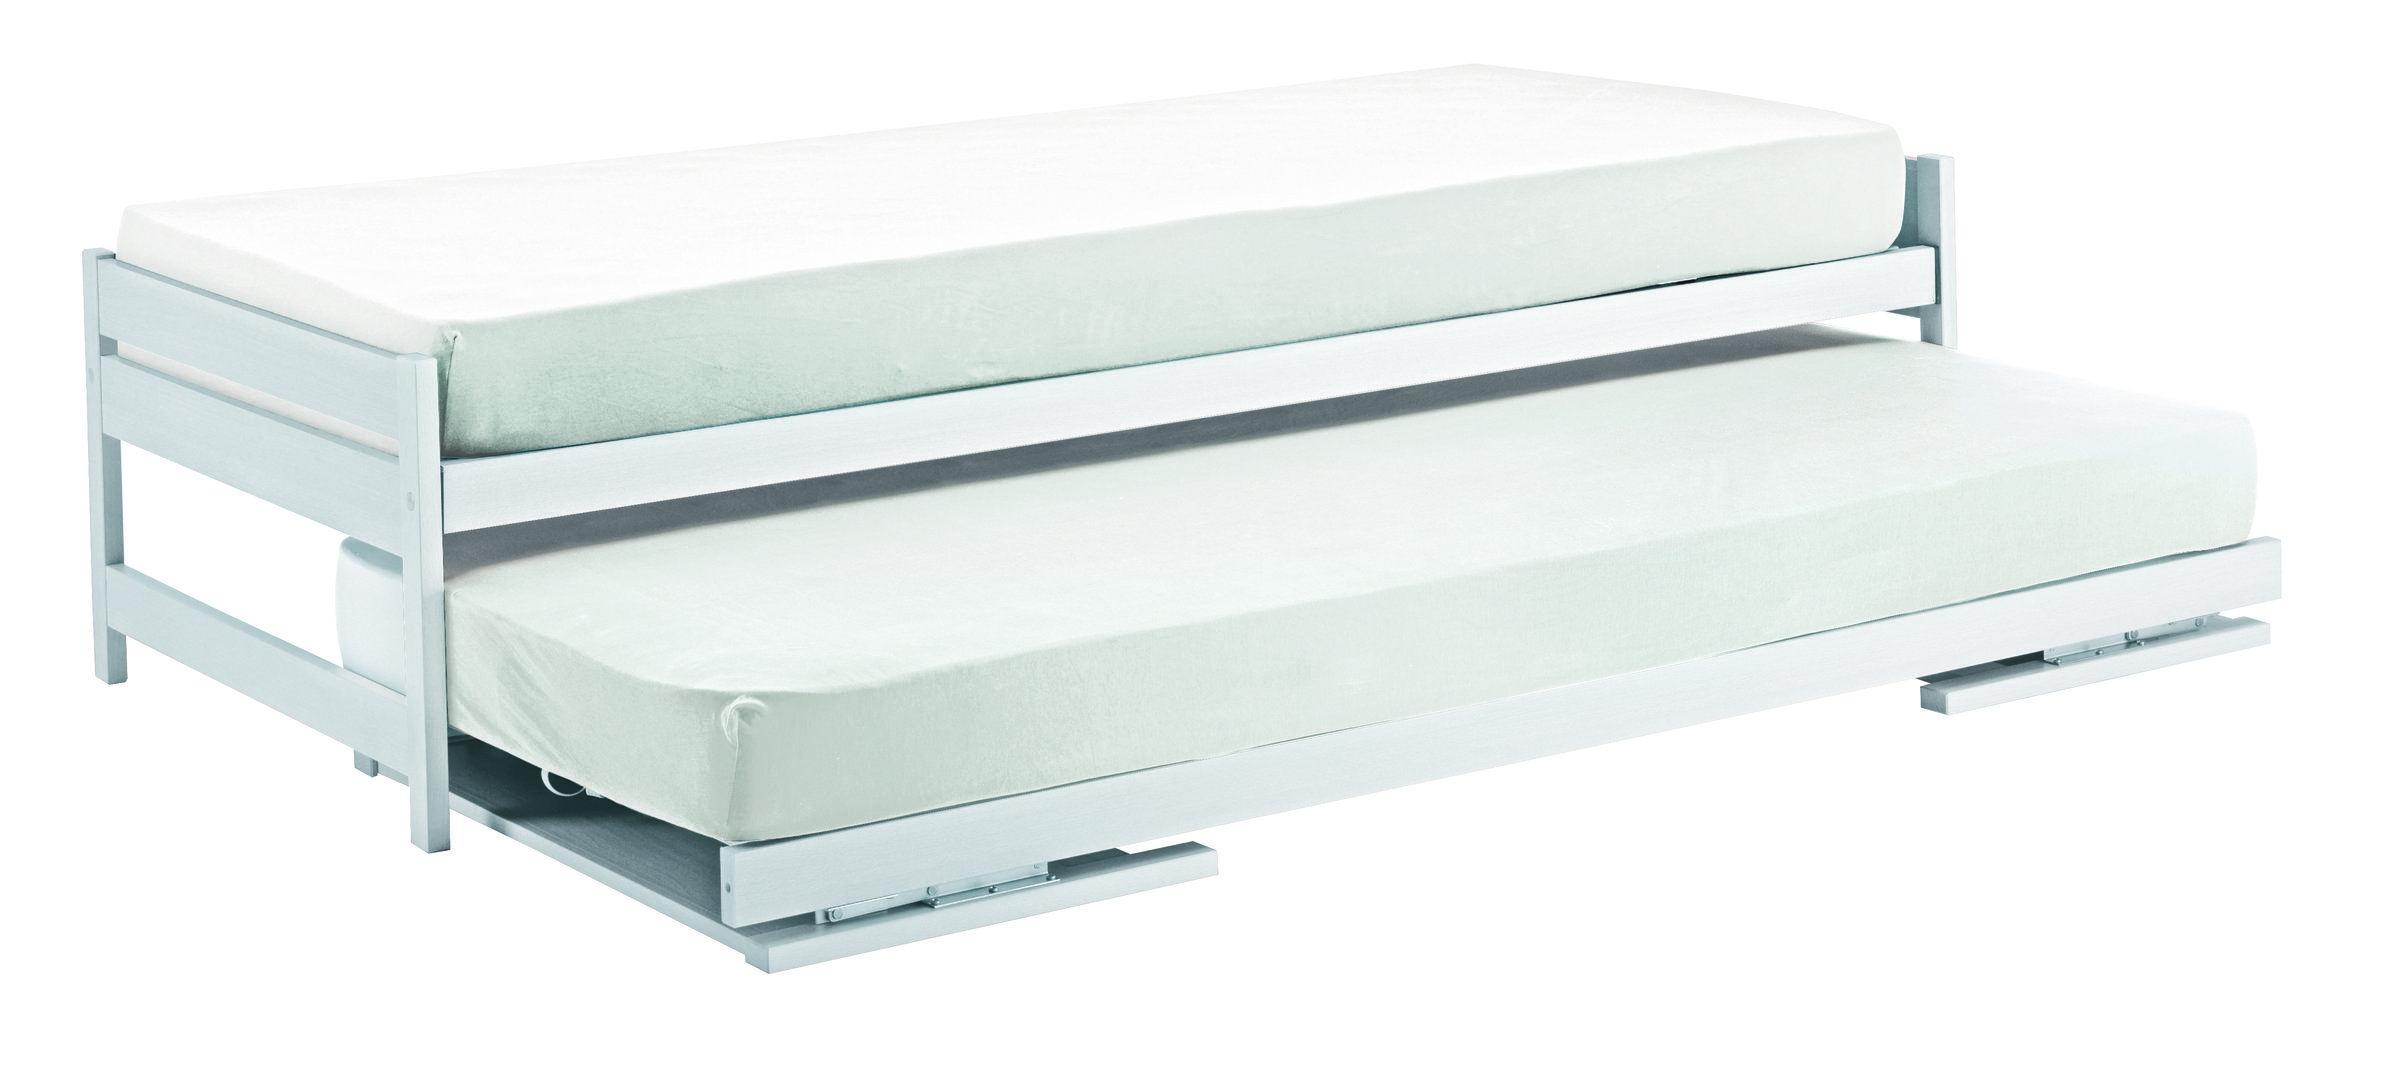 Doppelcouch Twin Ii Ausziehbar Zu Doppelbett Inkl Lattenrost Weiss Lackiert Couch Bett Raumsparbett